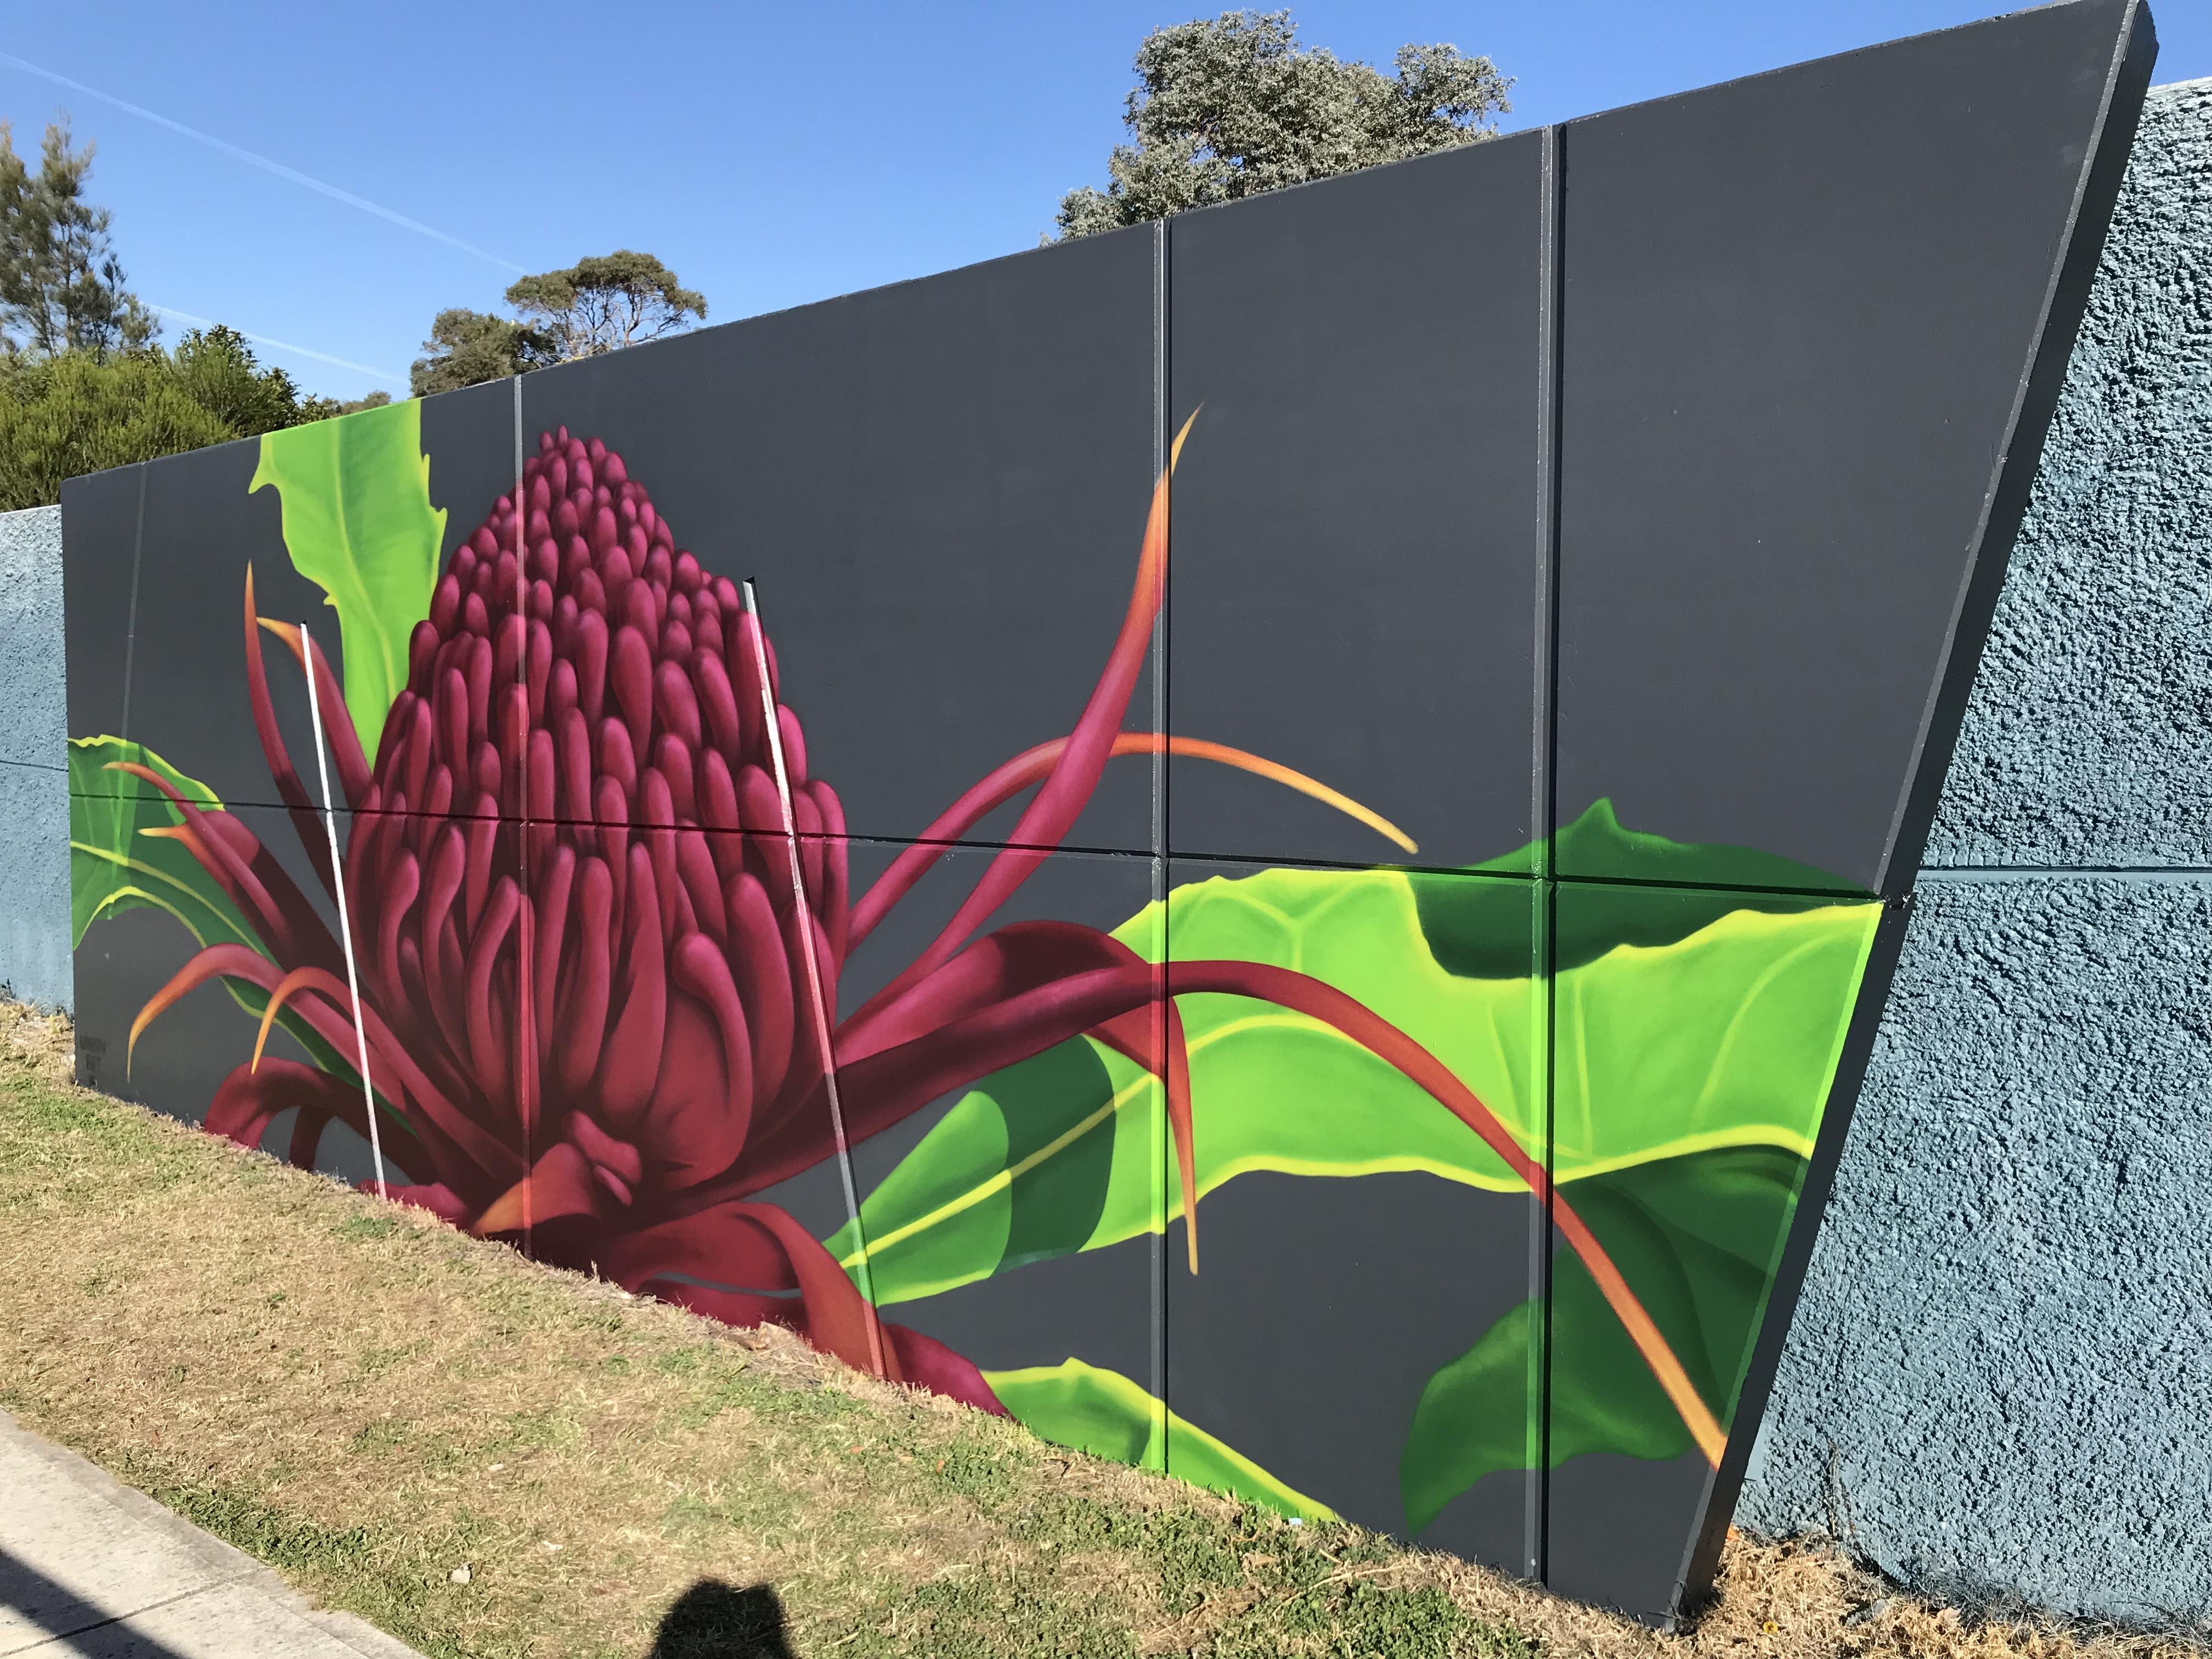 Australian Waratah flower mural art